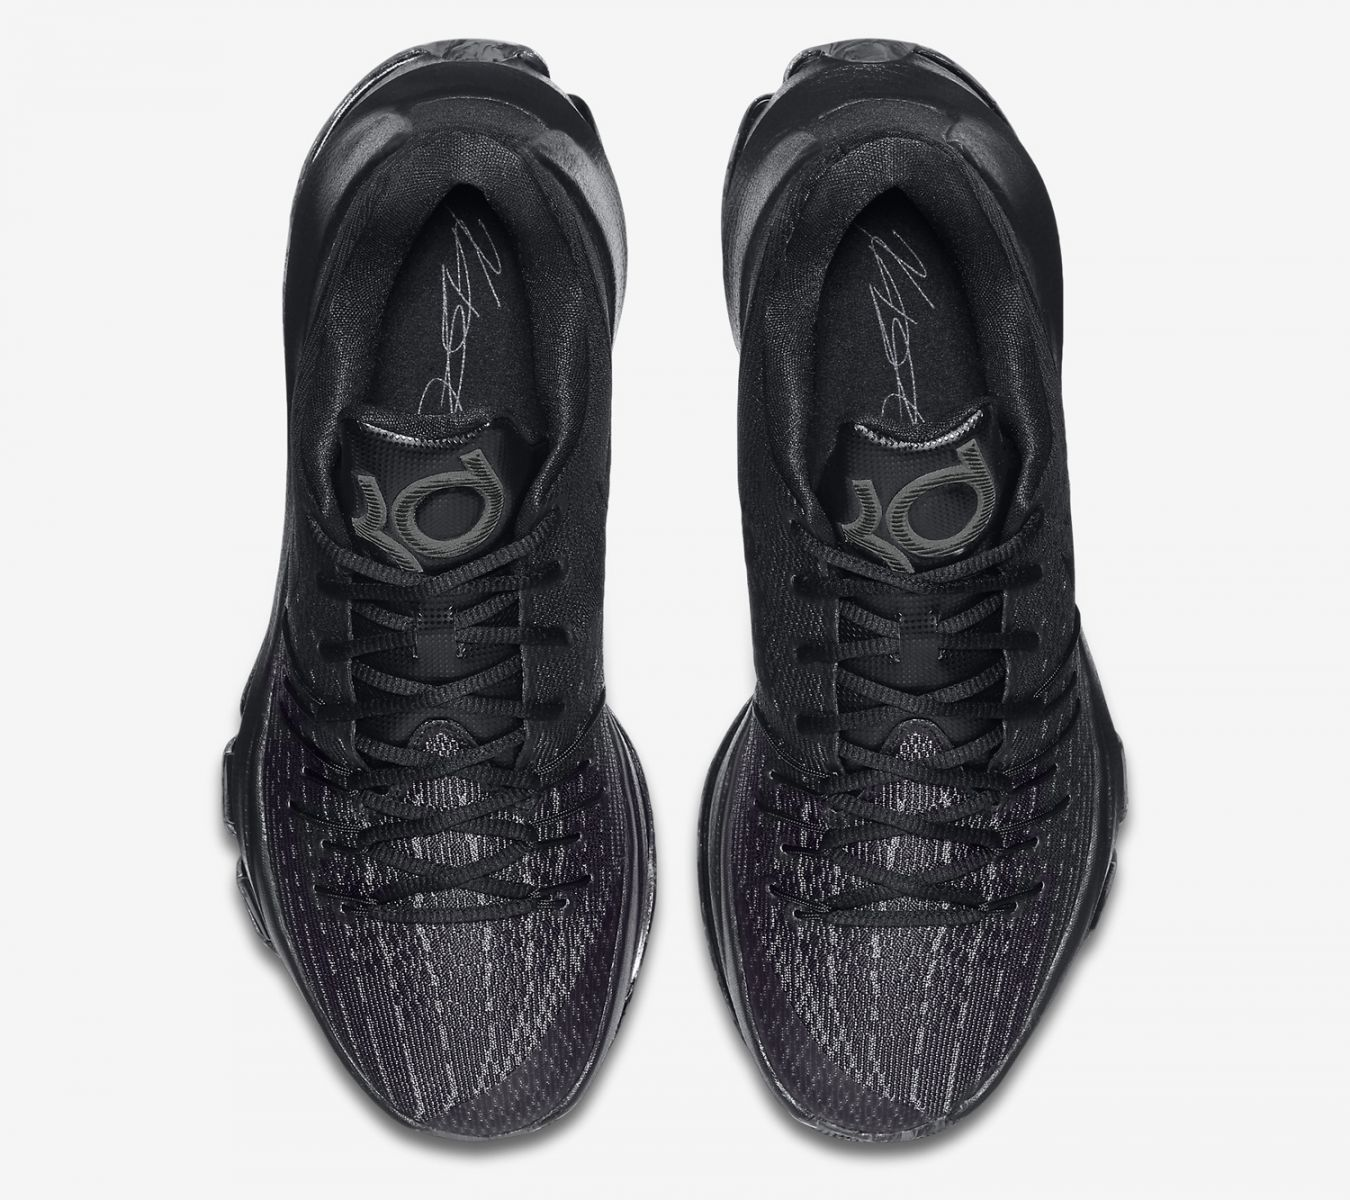 e09aaf3d854 Nike KD 8